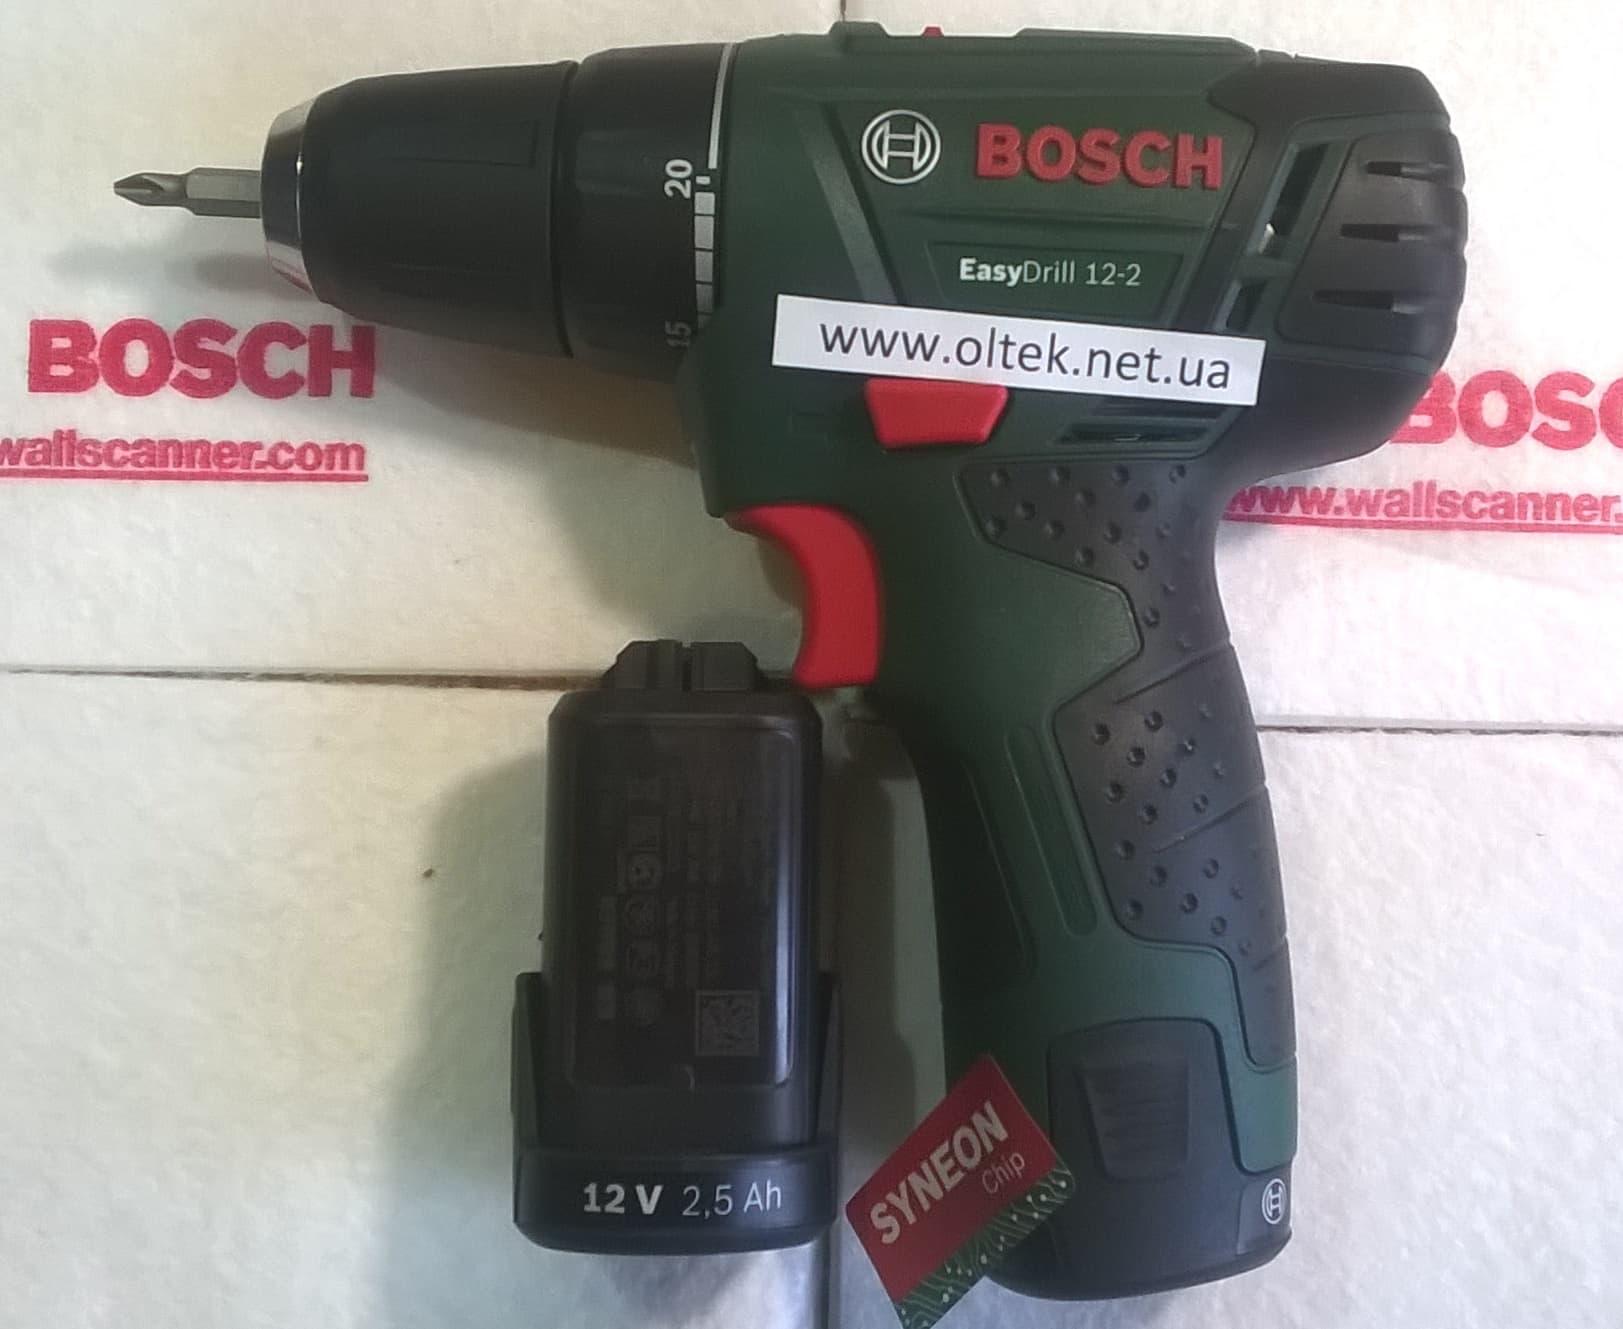 Bosch-EasyDrill 12-2-oltek-net-ua